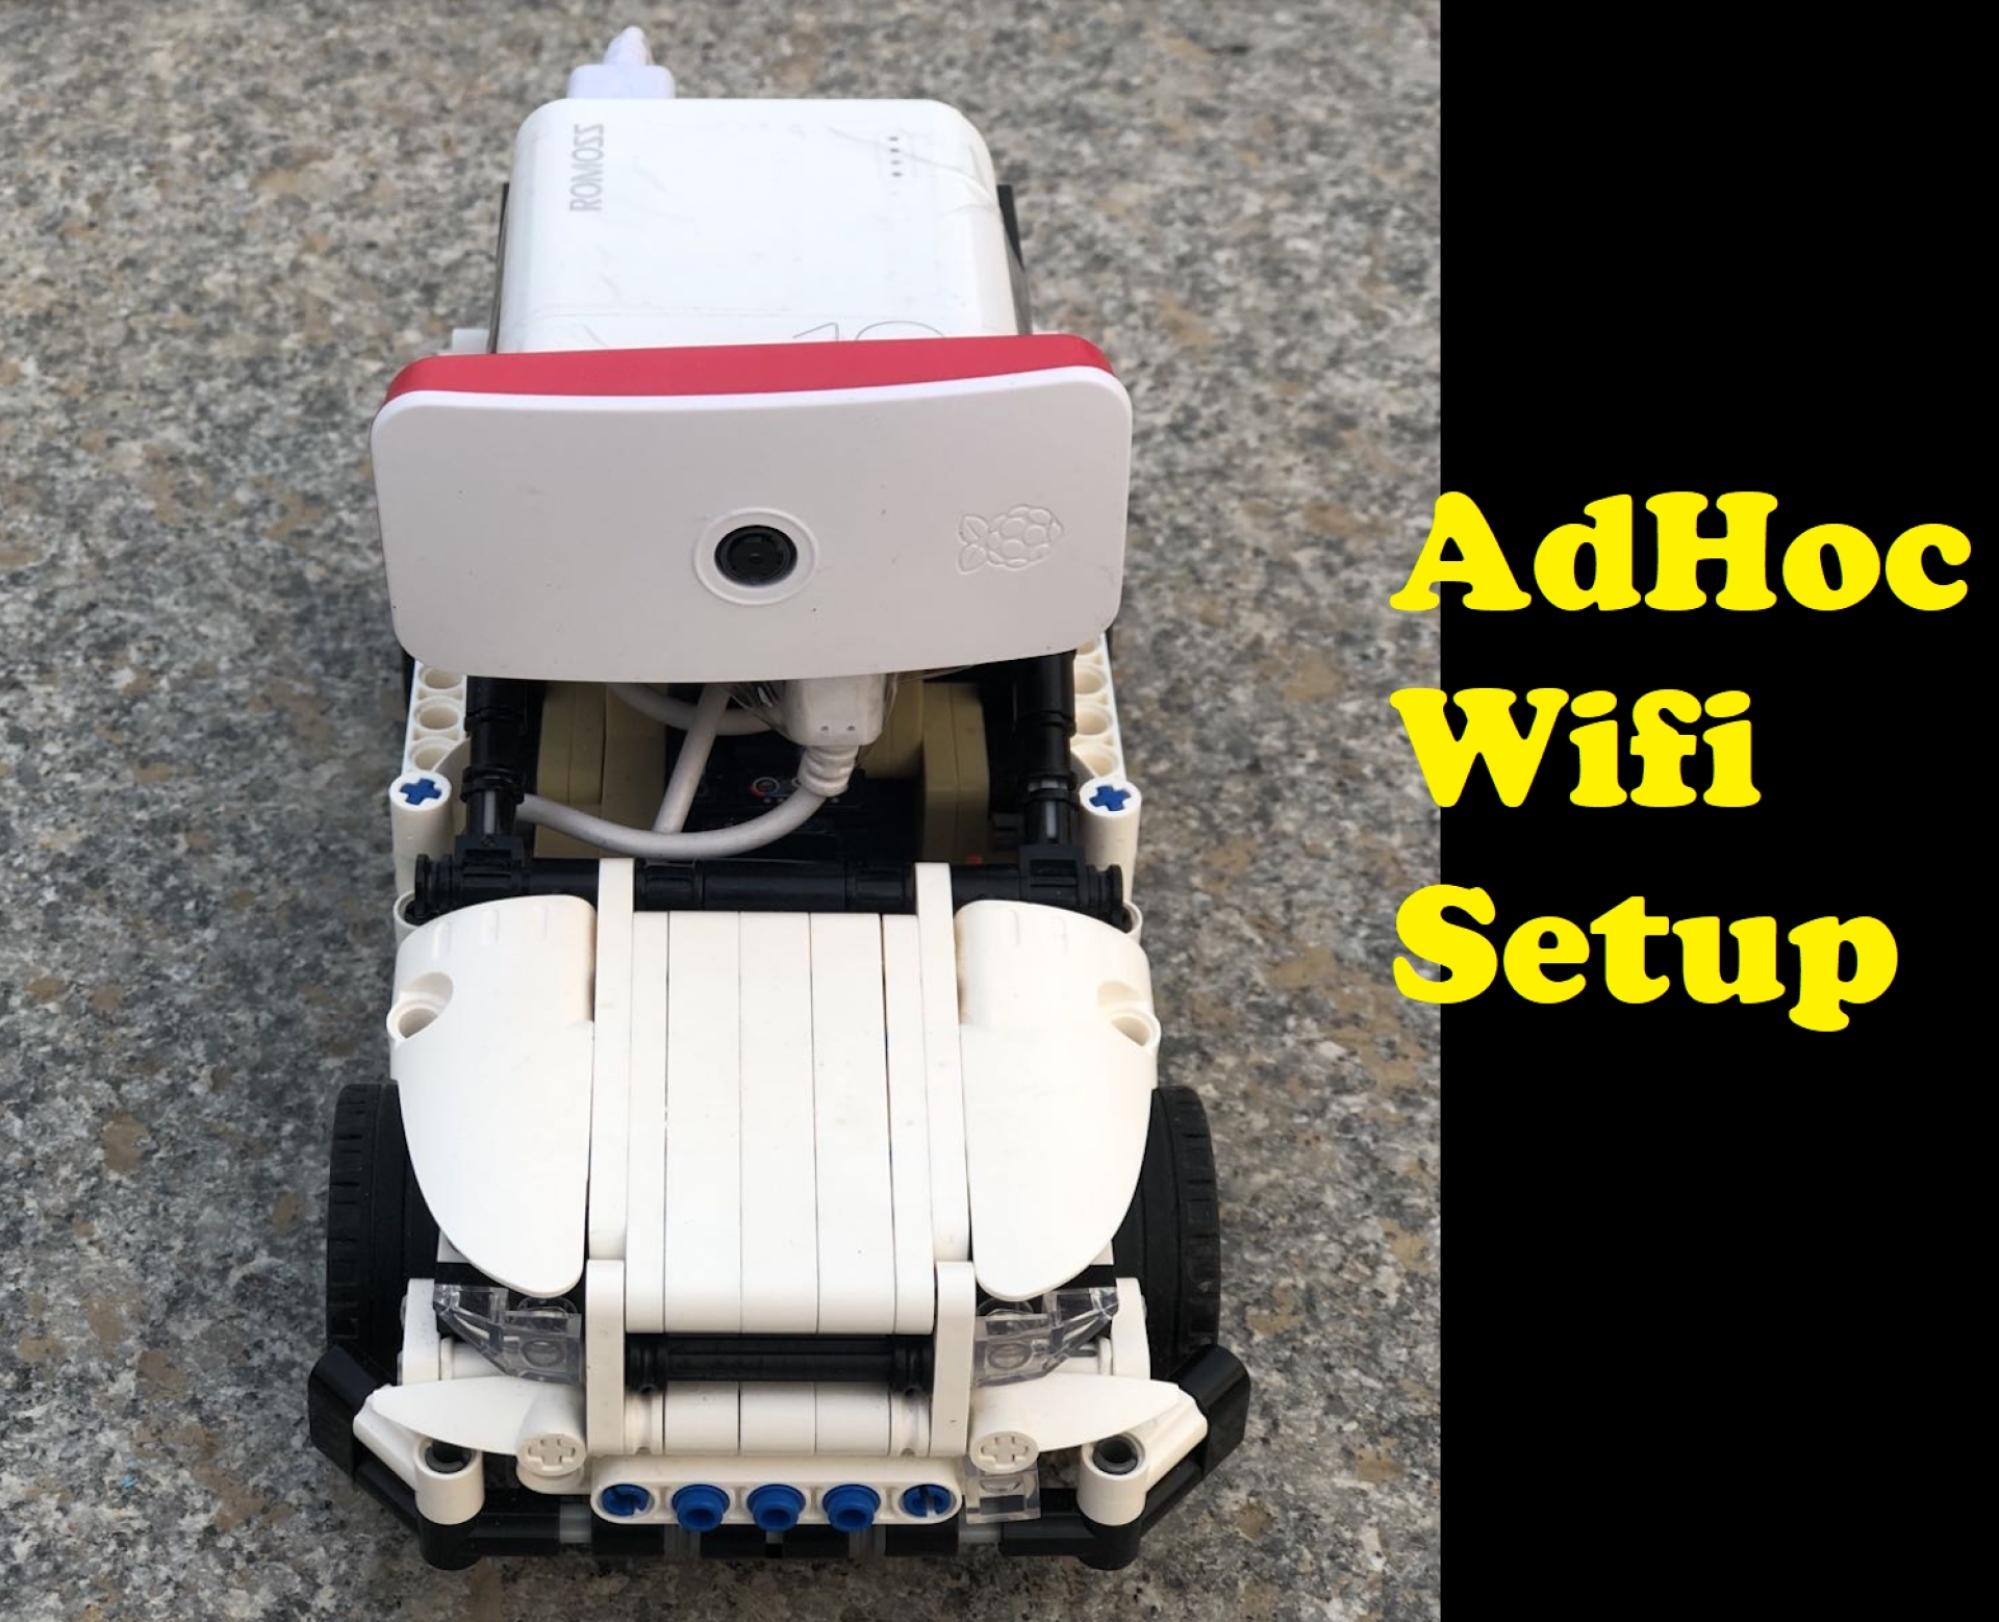 How to configure Raspberry Pi in Ad hoc wifi mode